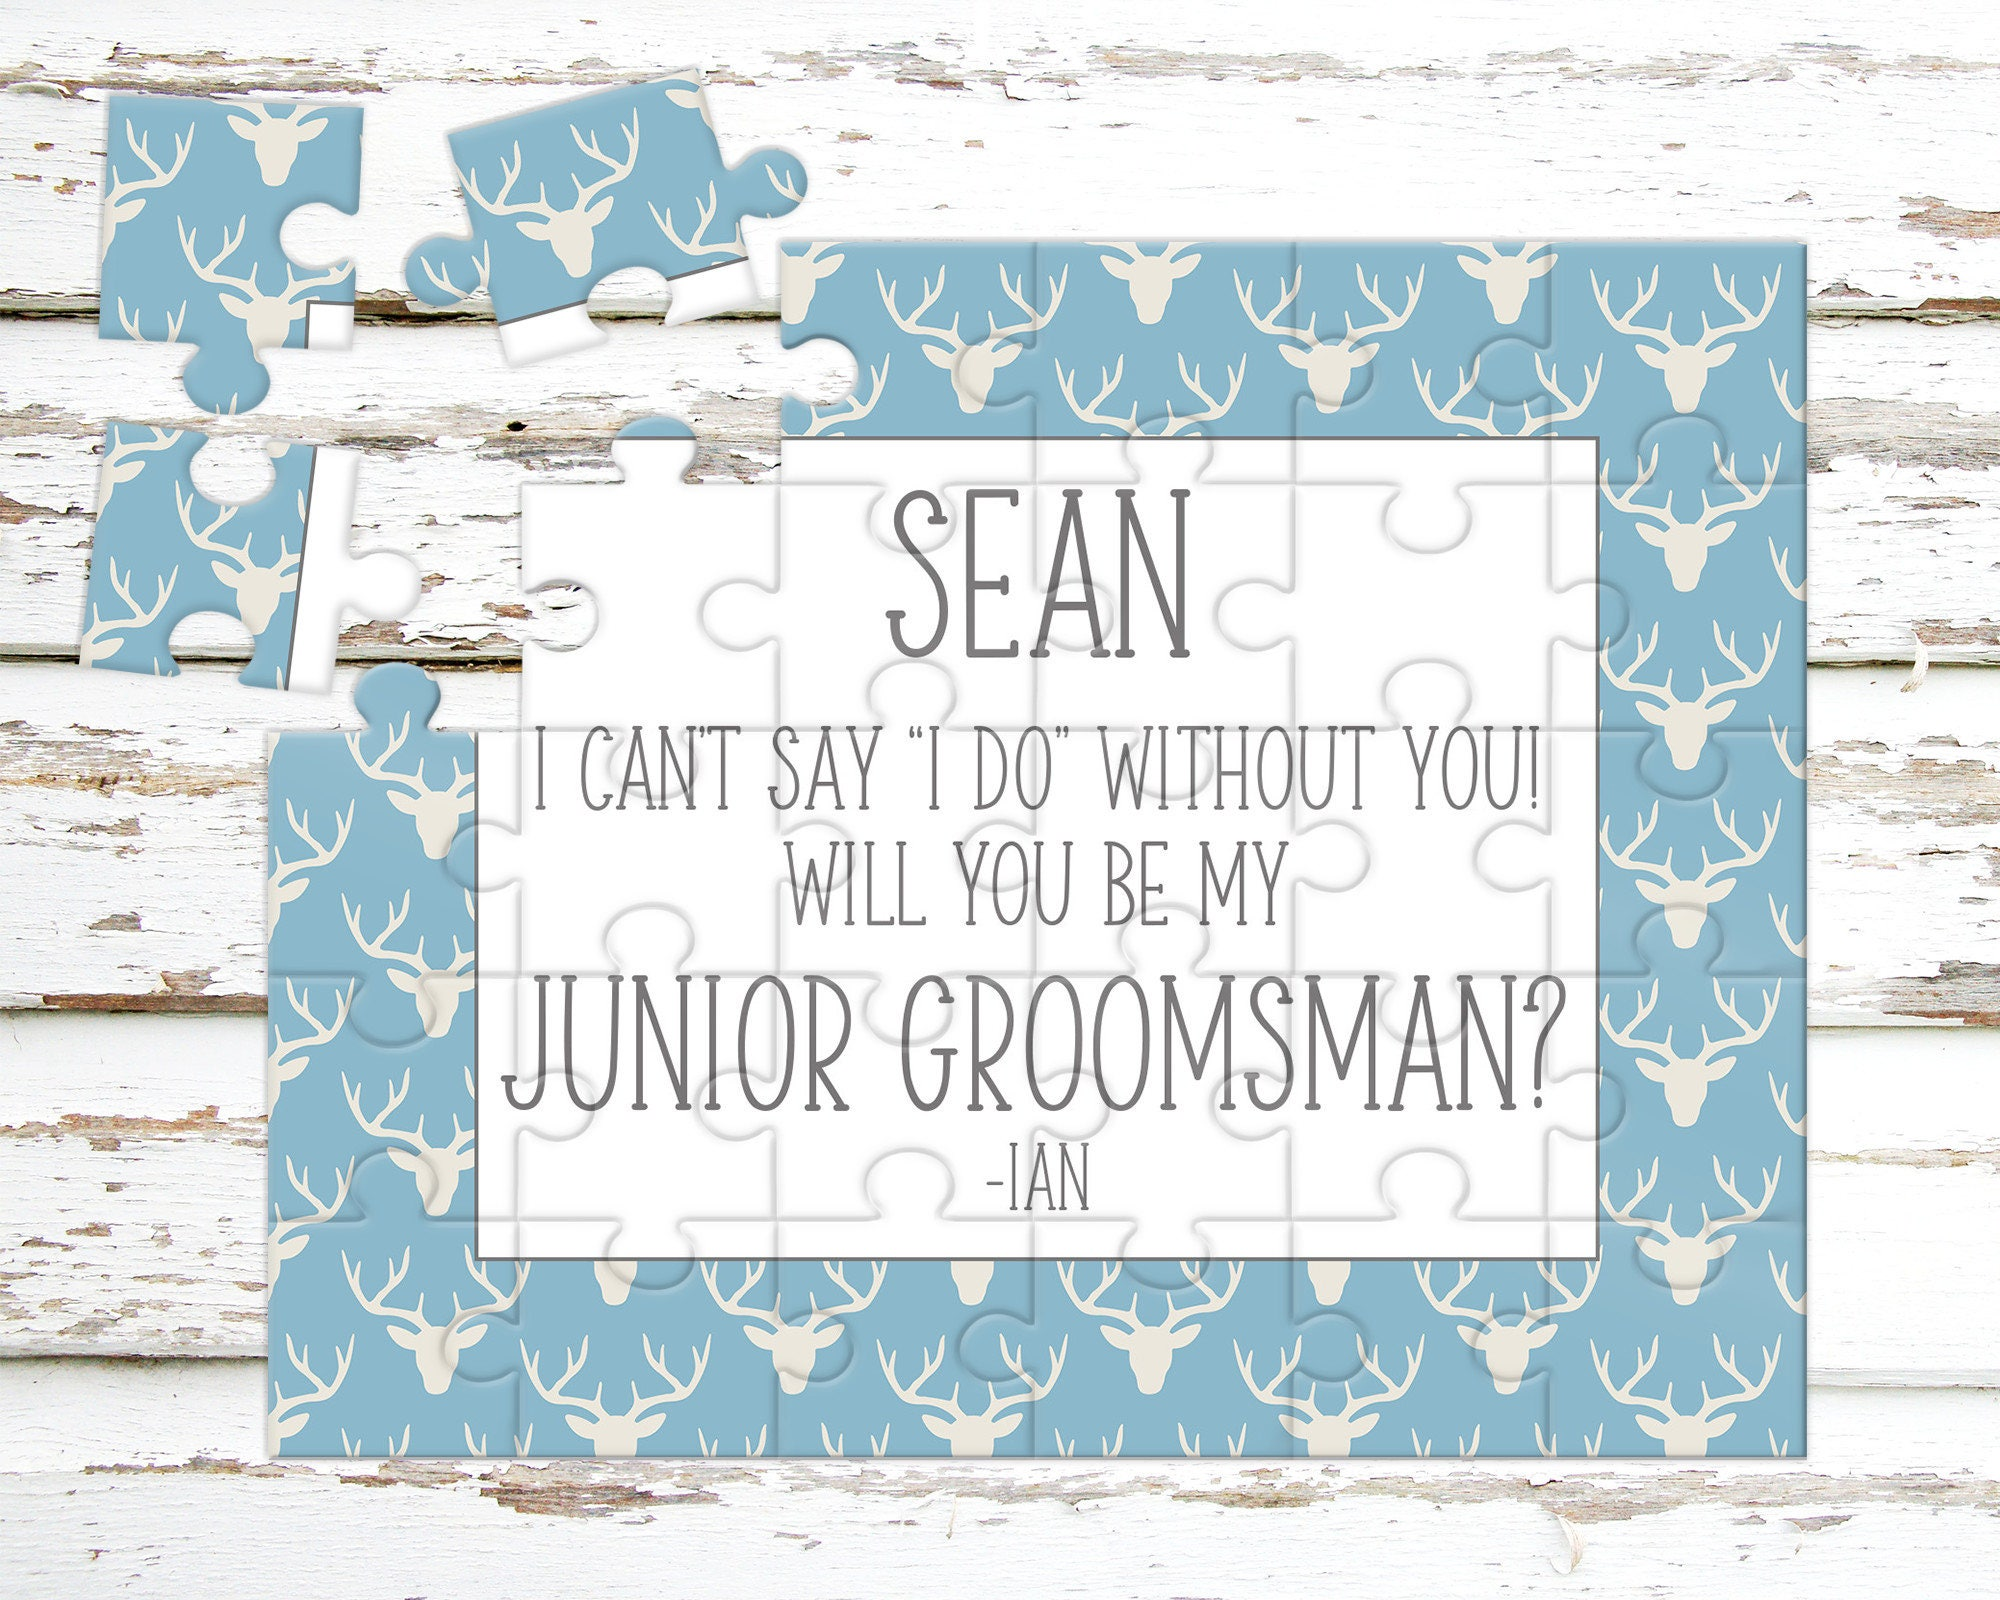 Puzzle Proposal Personalized Junior Groomsman Puzzle Asking Junior Groomsman Wedding Announcement P1197